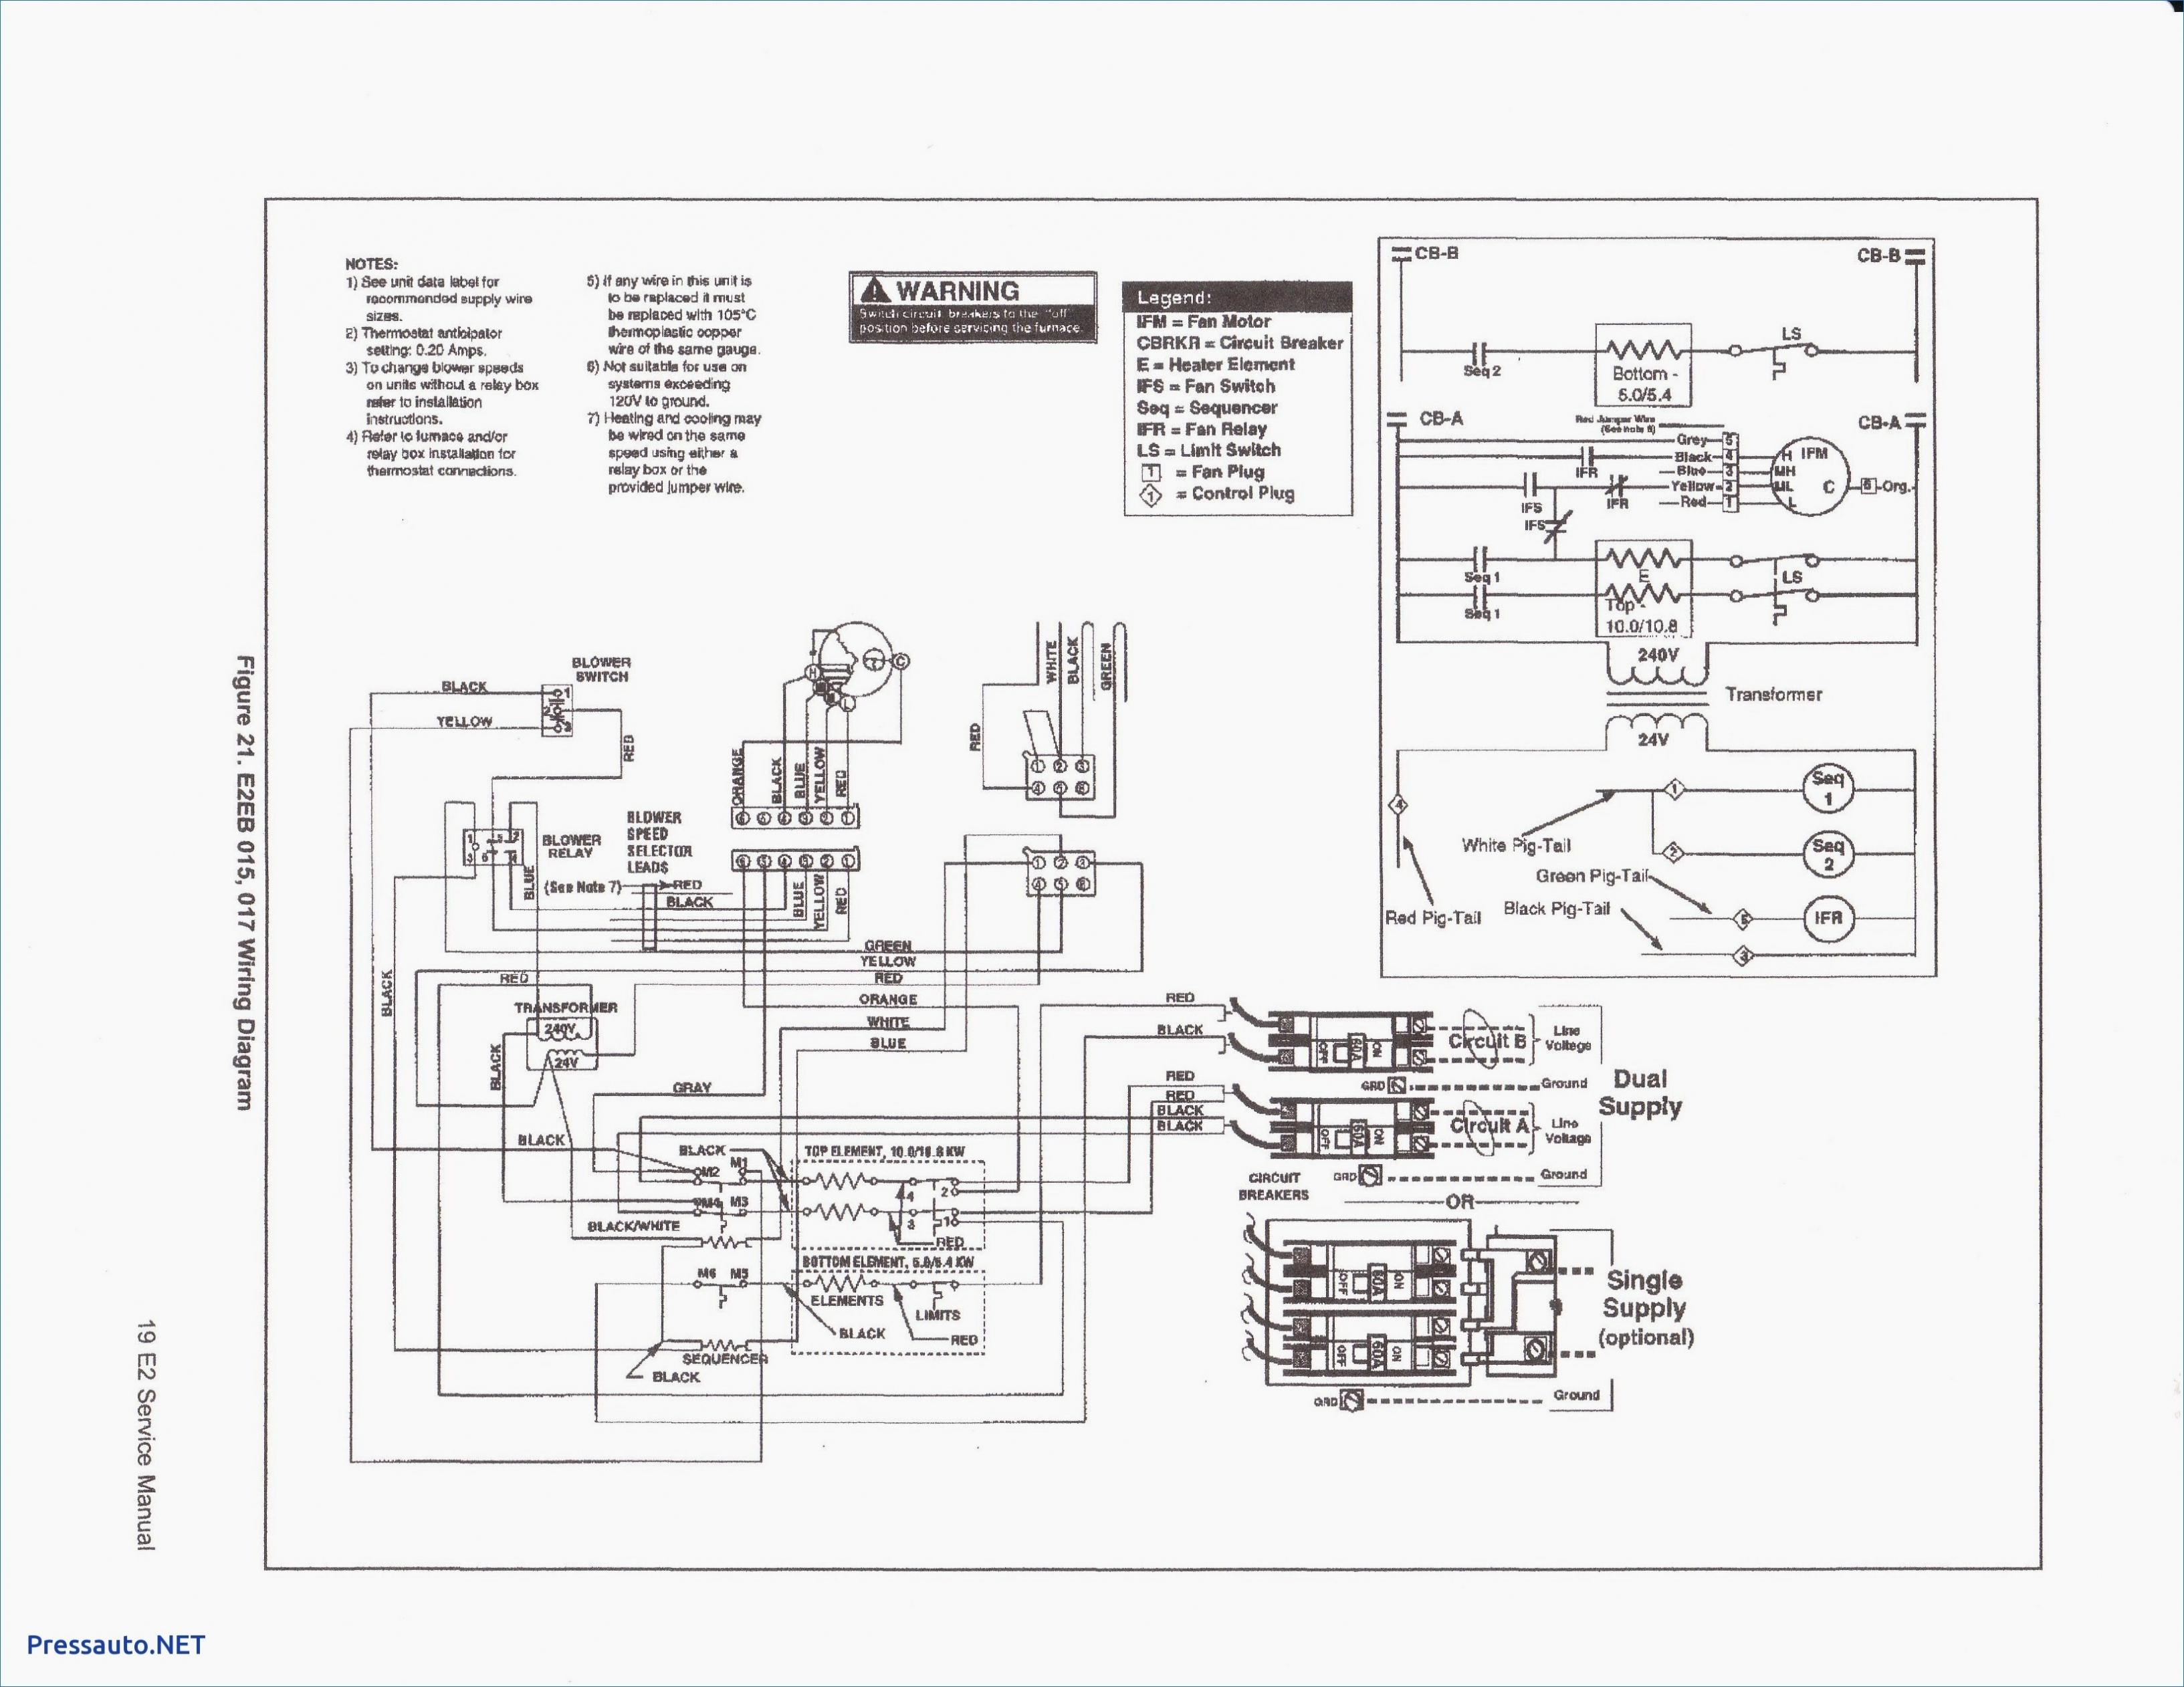 Goodman Furnace Thermostat Wiring Diagram 100 4 - Wiring Diagrams Hubs - Furnace Thermostat Wiring Diagram